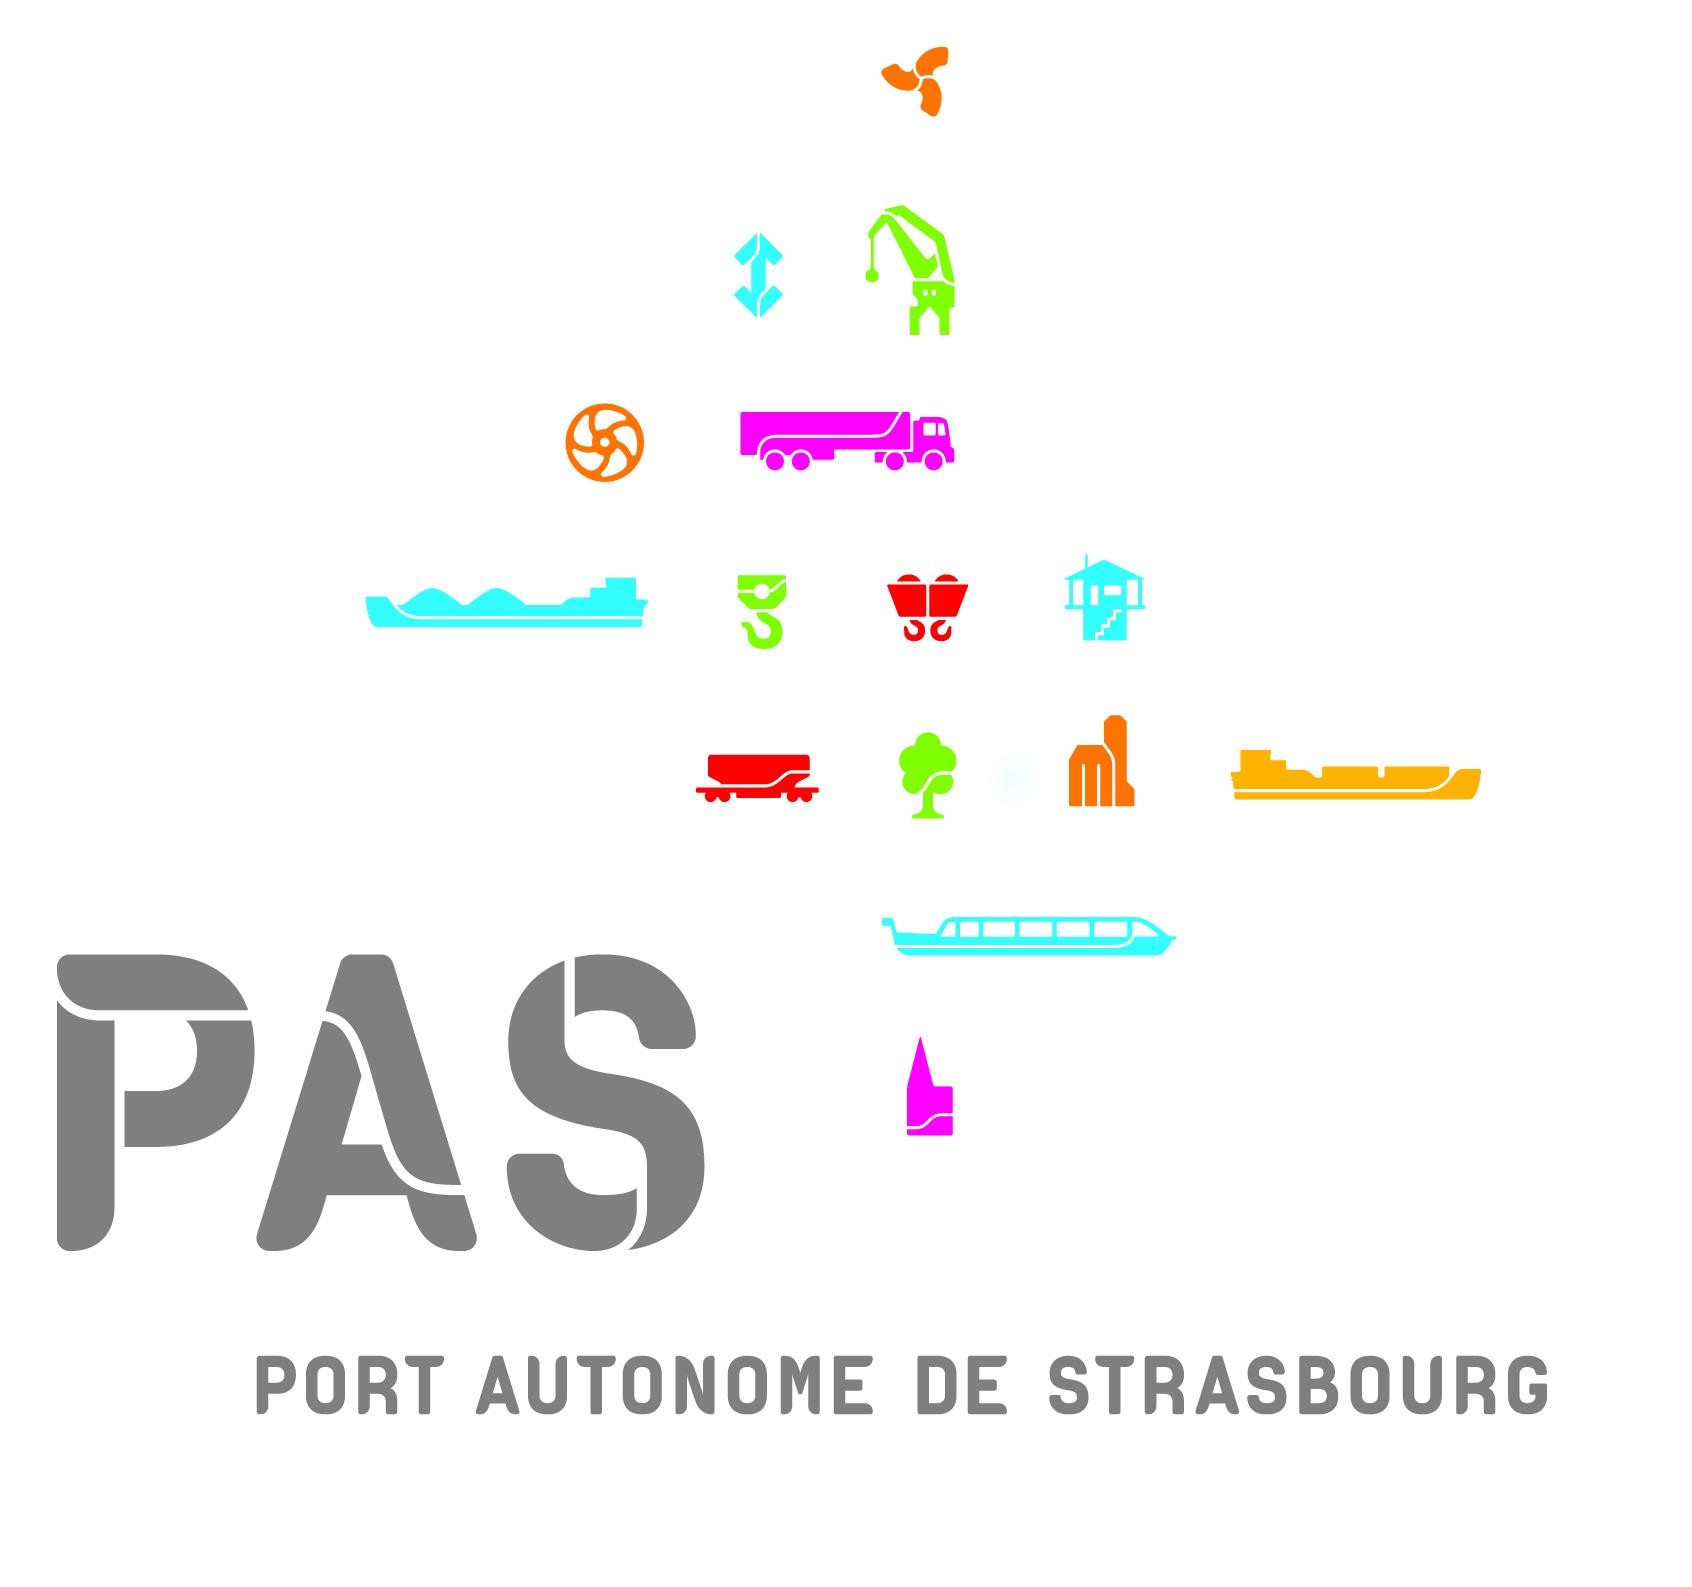 offre d u0026 39 emploi port autonome de strasbourg